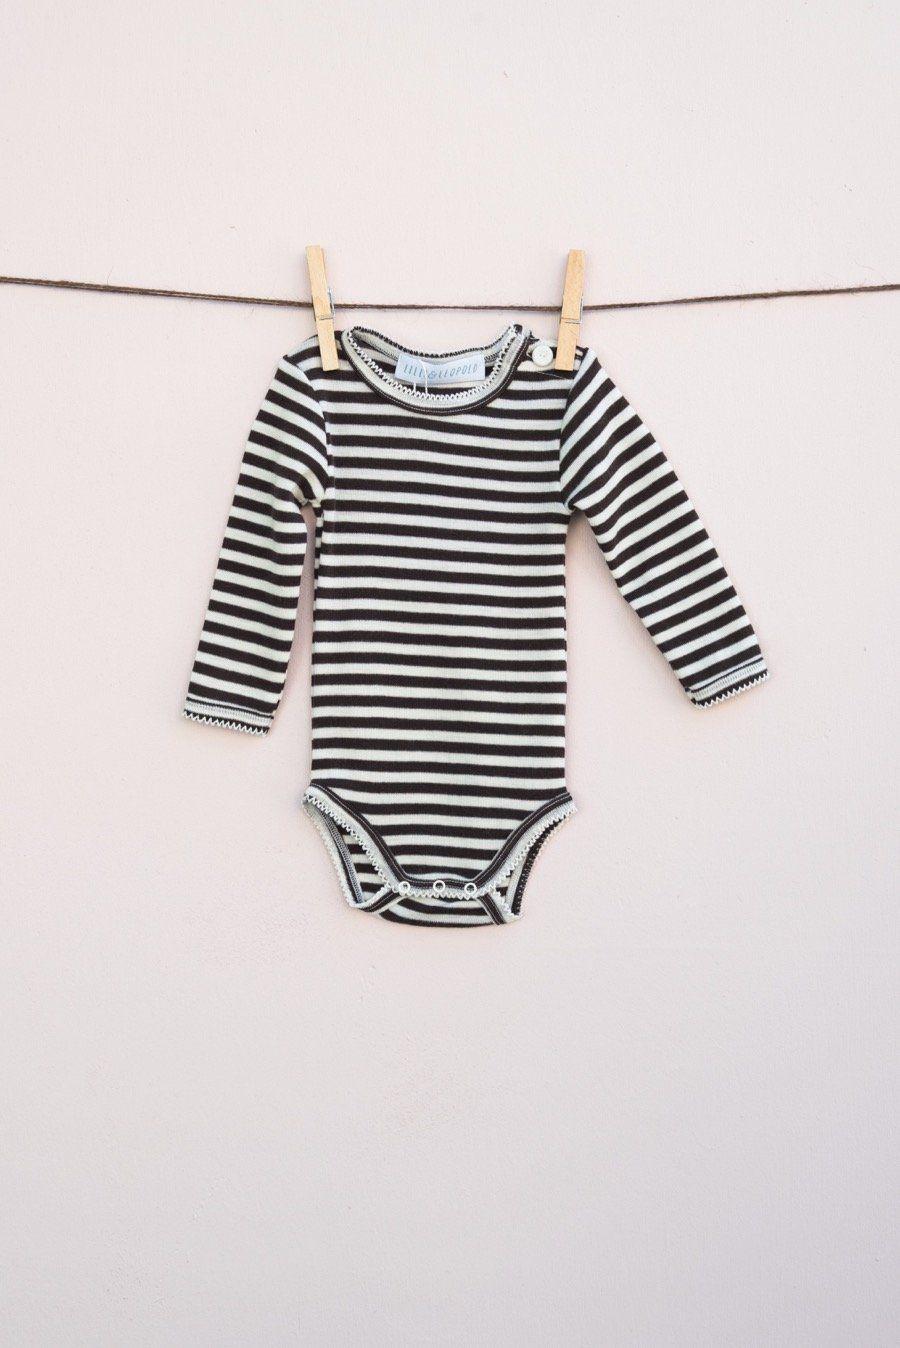 The Best Scandinavian Clothing Brands For Kids